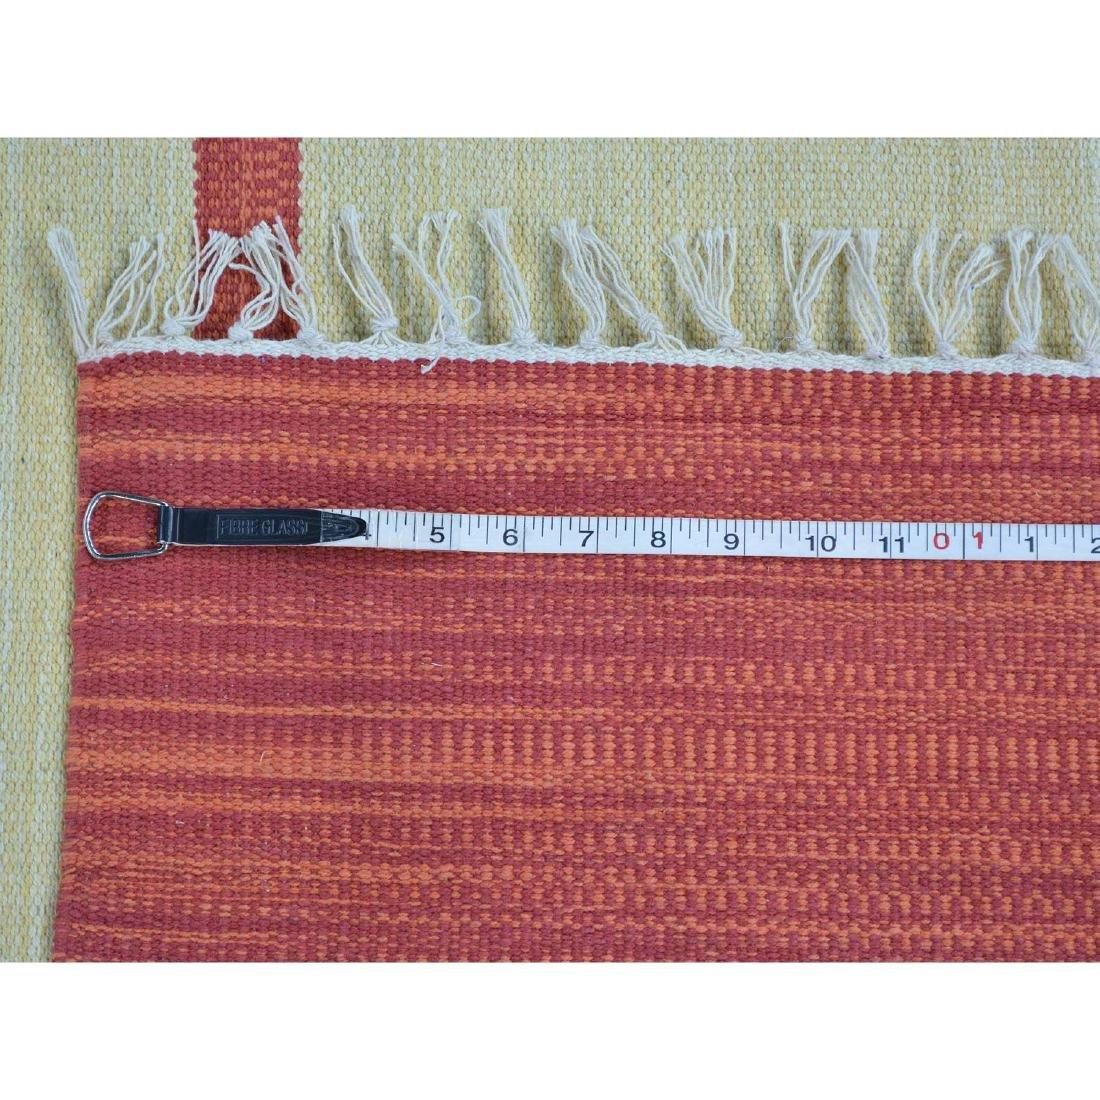 Navajo Design Hand Woven Flat Weave Killim Rug - 5